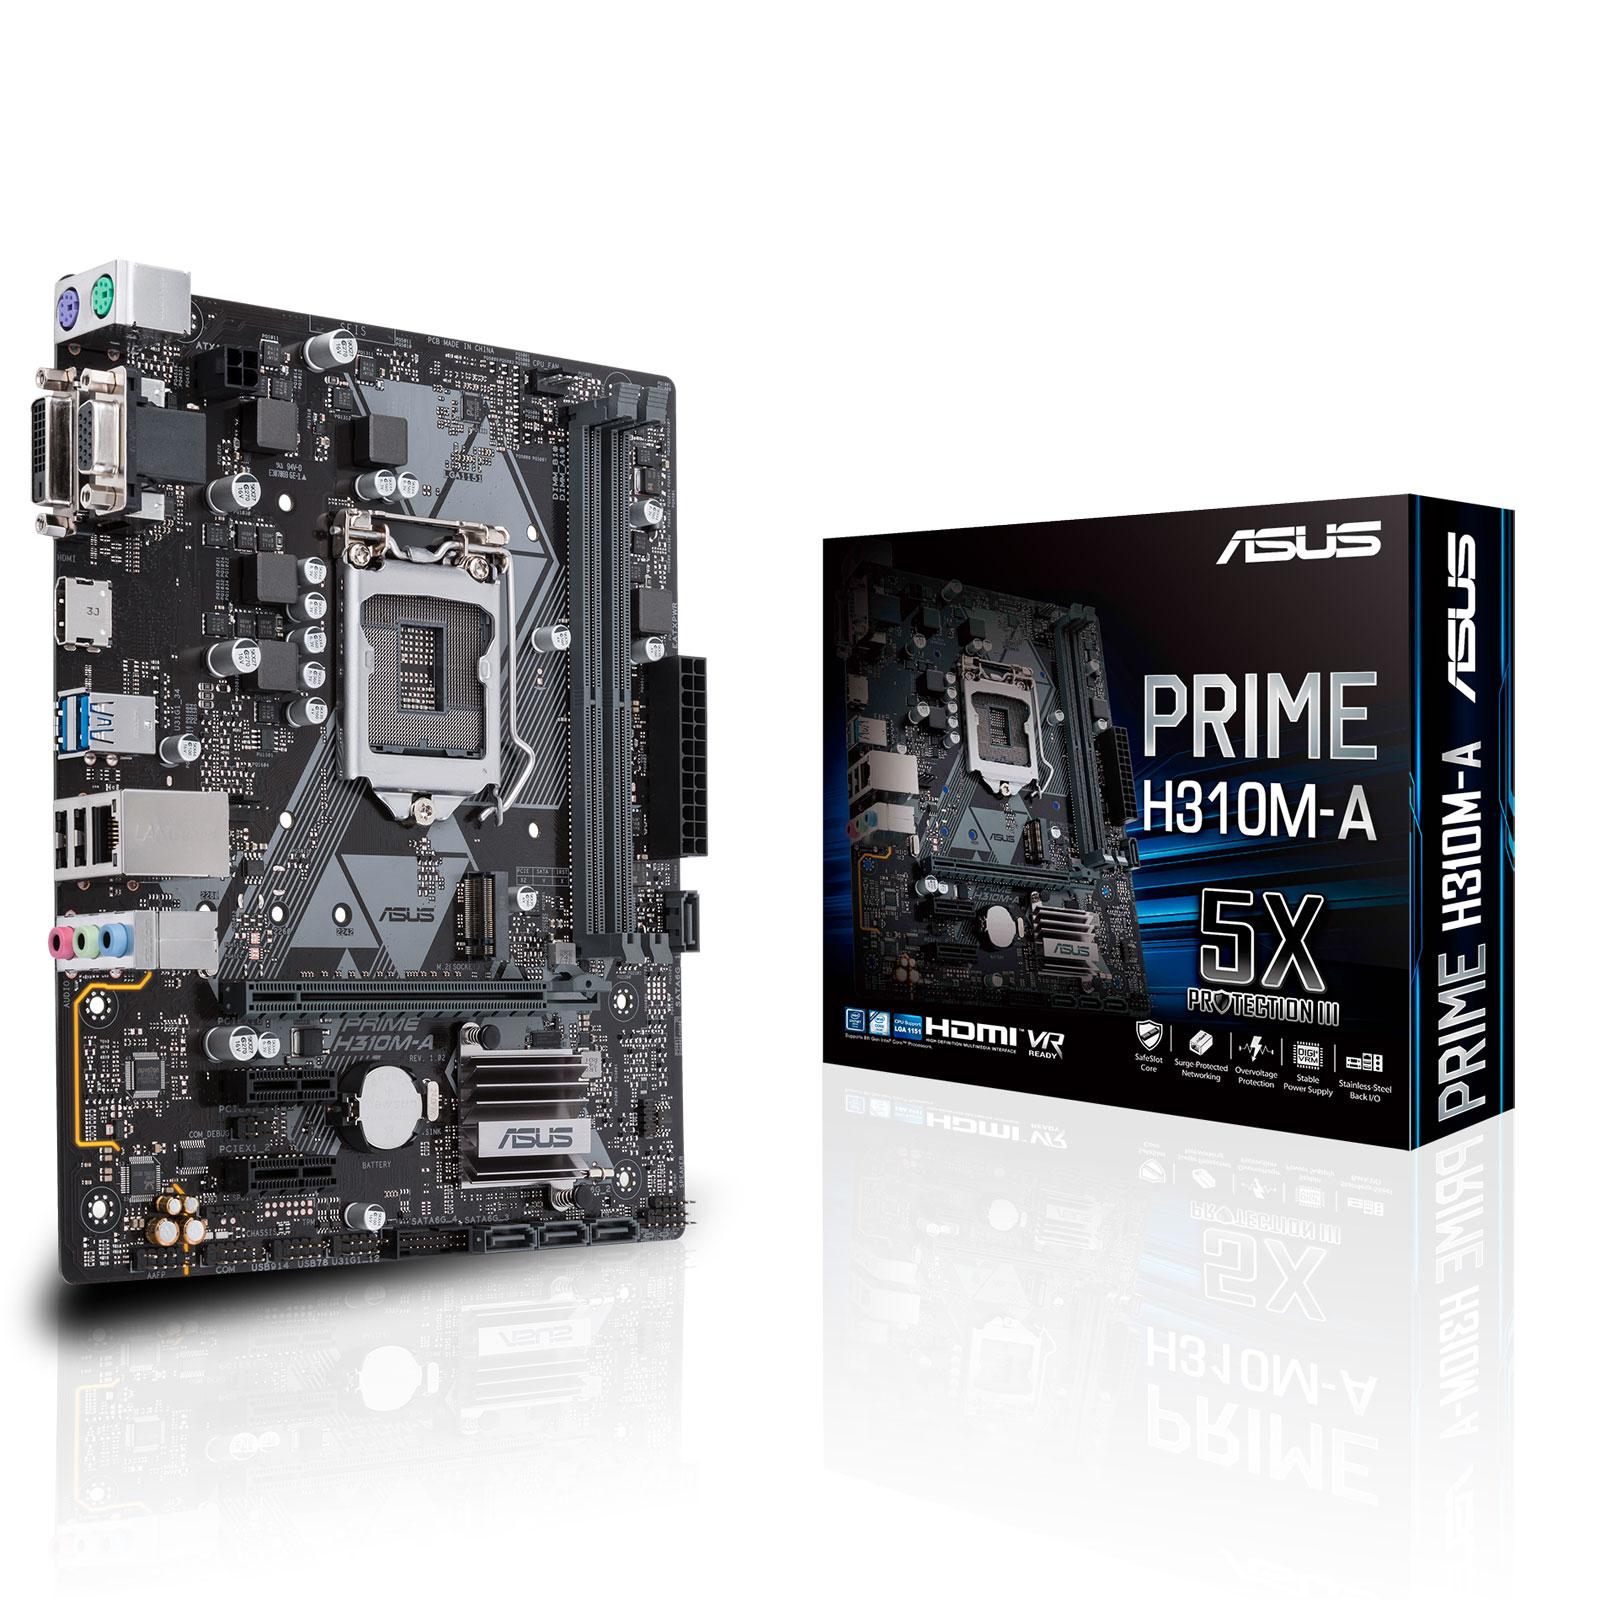 Carte mère ASUS PRIME H310M-A Carte mère Micro ATX Socket 1151 Intel H310 Express - 2x DDR4 - SATA 6Gb/s + M.2 - USB 3.0 - 1x PCI-Express 3.0 16x